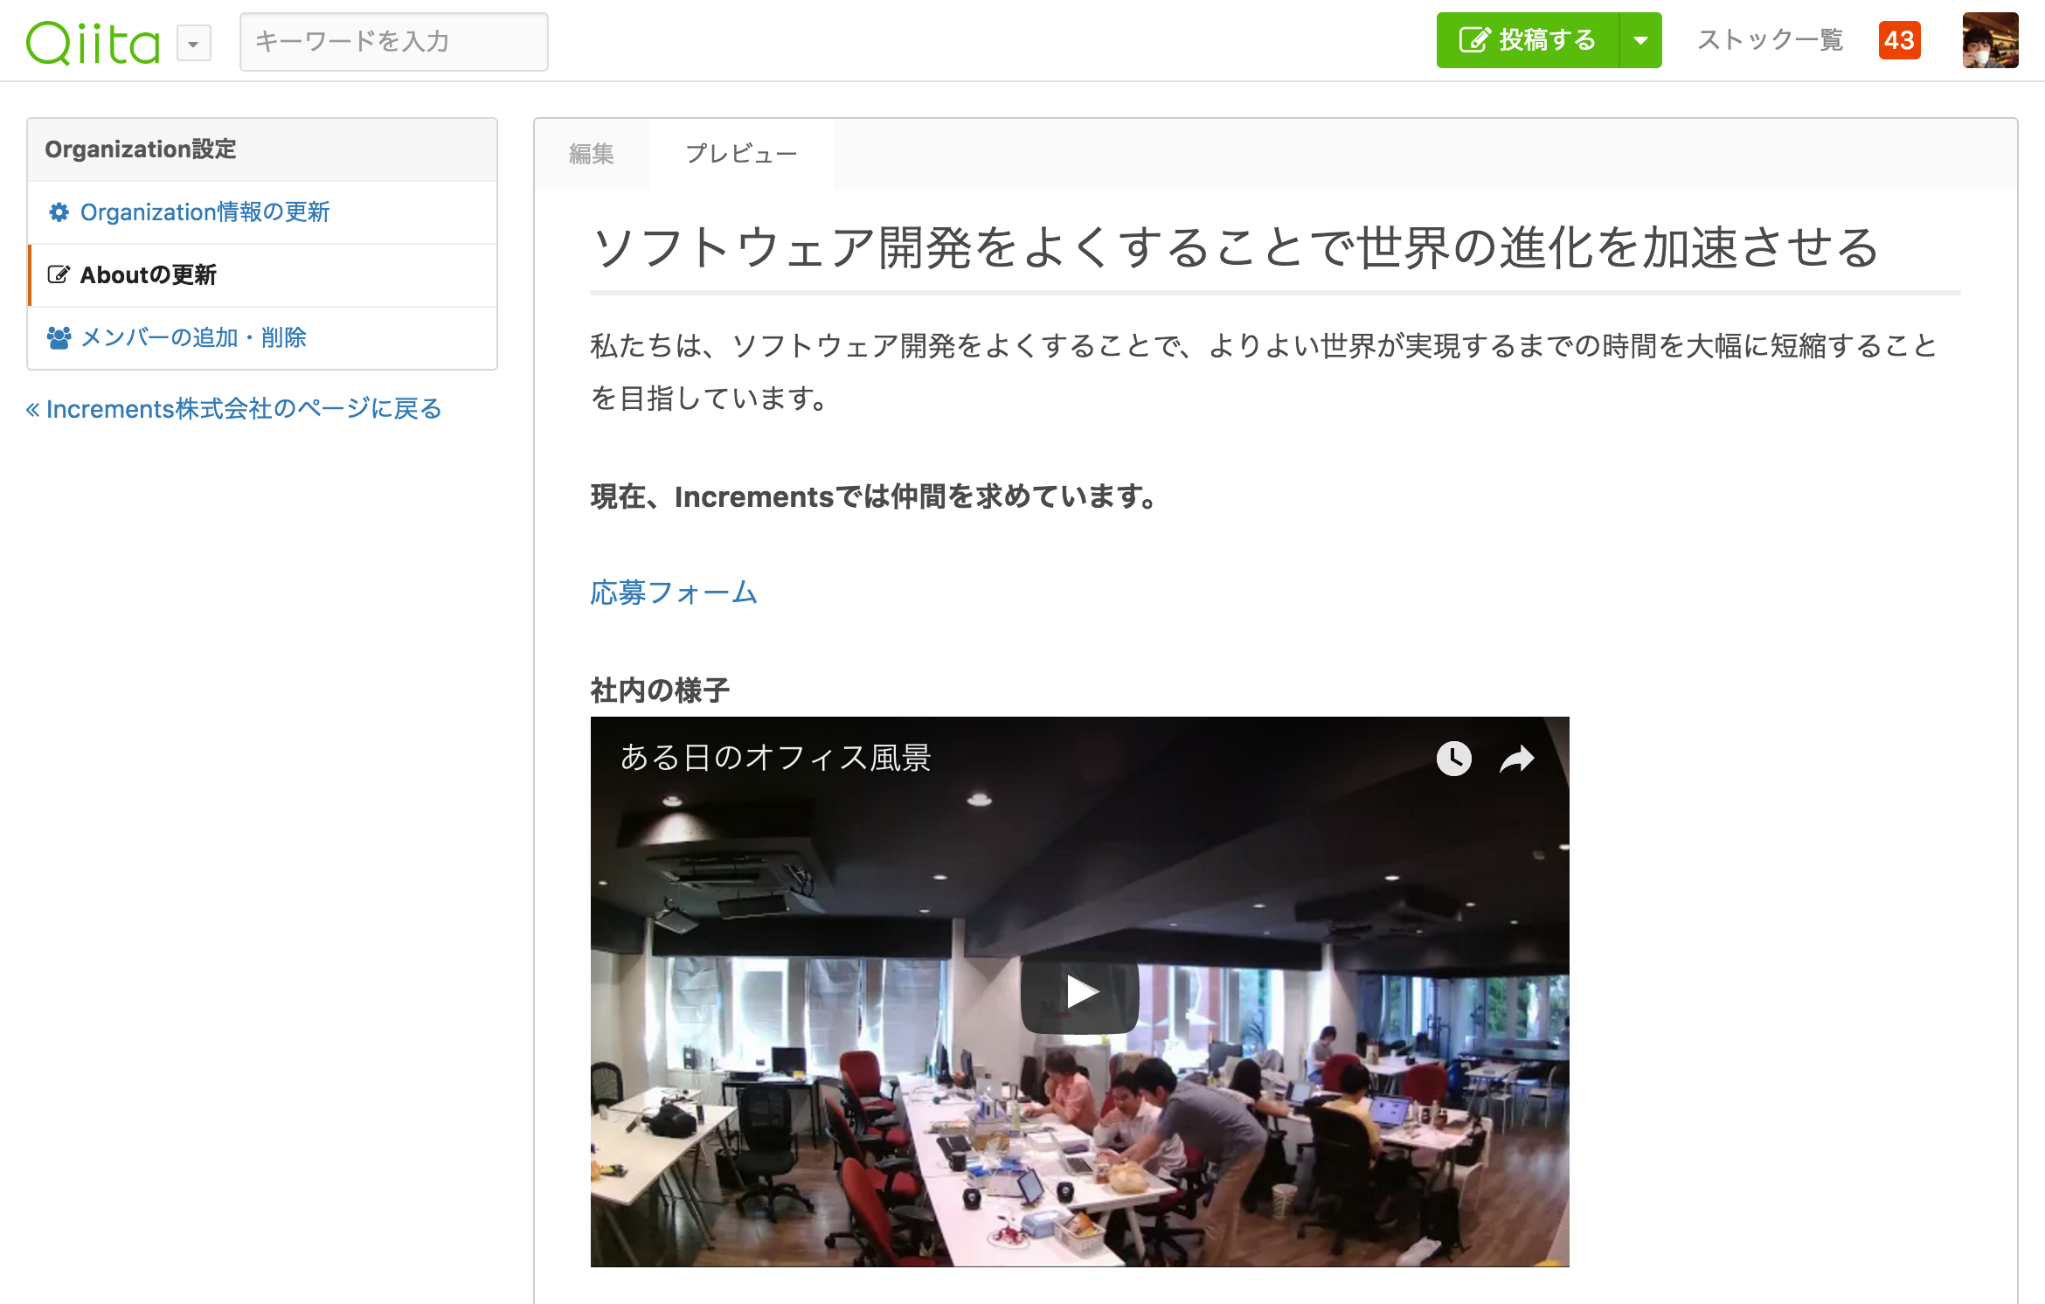 org3.jpeg